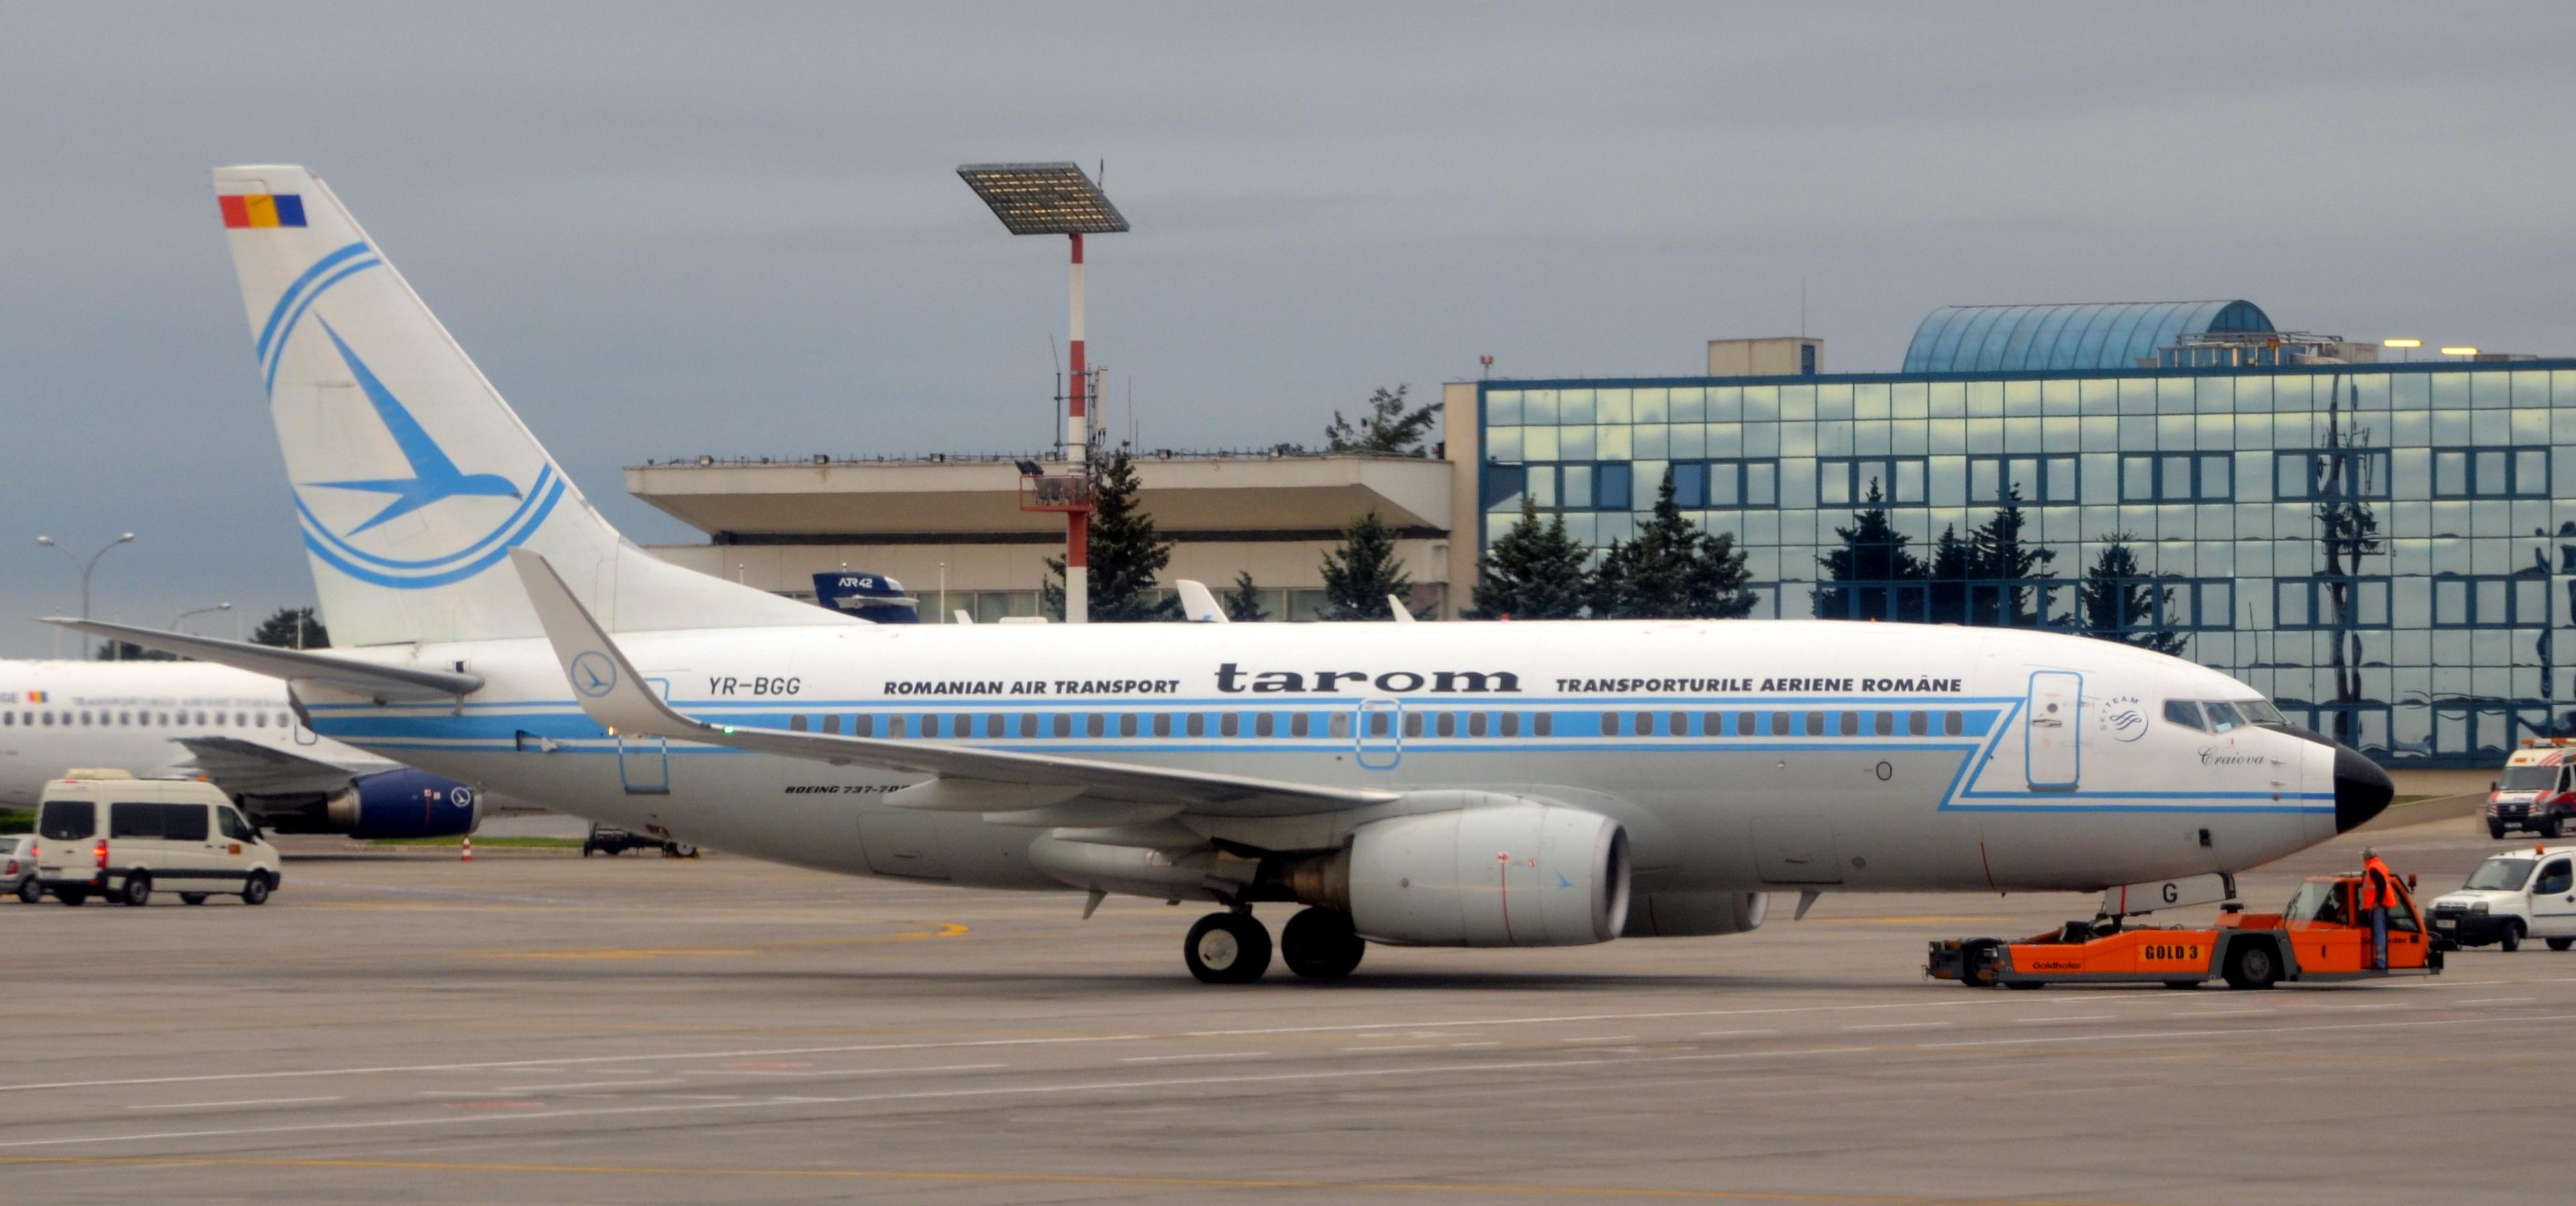 type of plane that crashed. photo: wiki